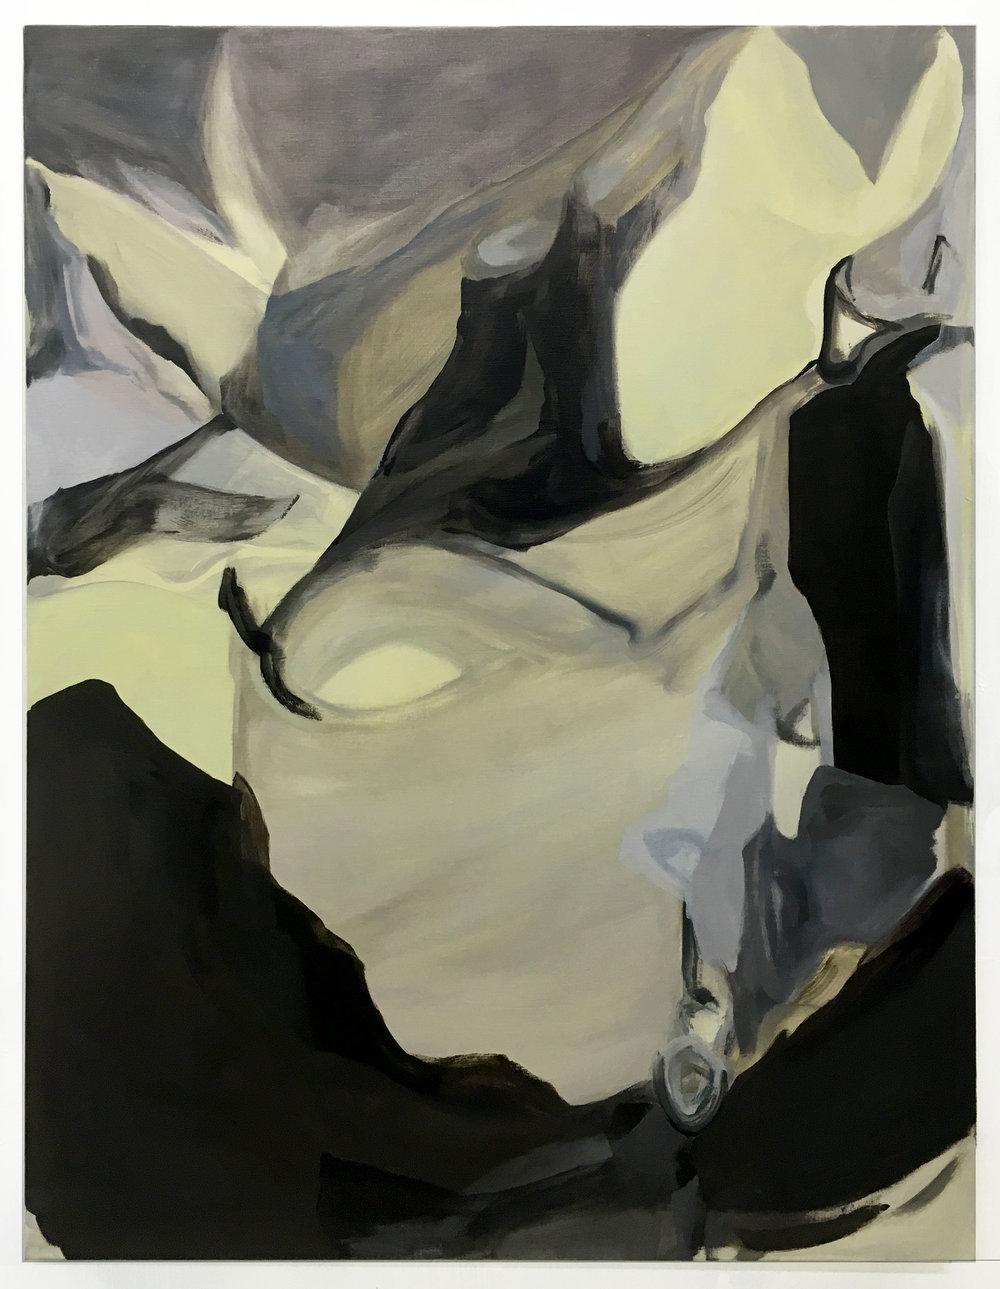 What Happened Here, Oil on Linen, 2017 102 x 76 cm